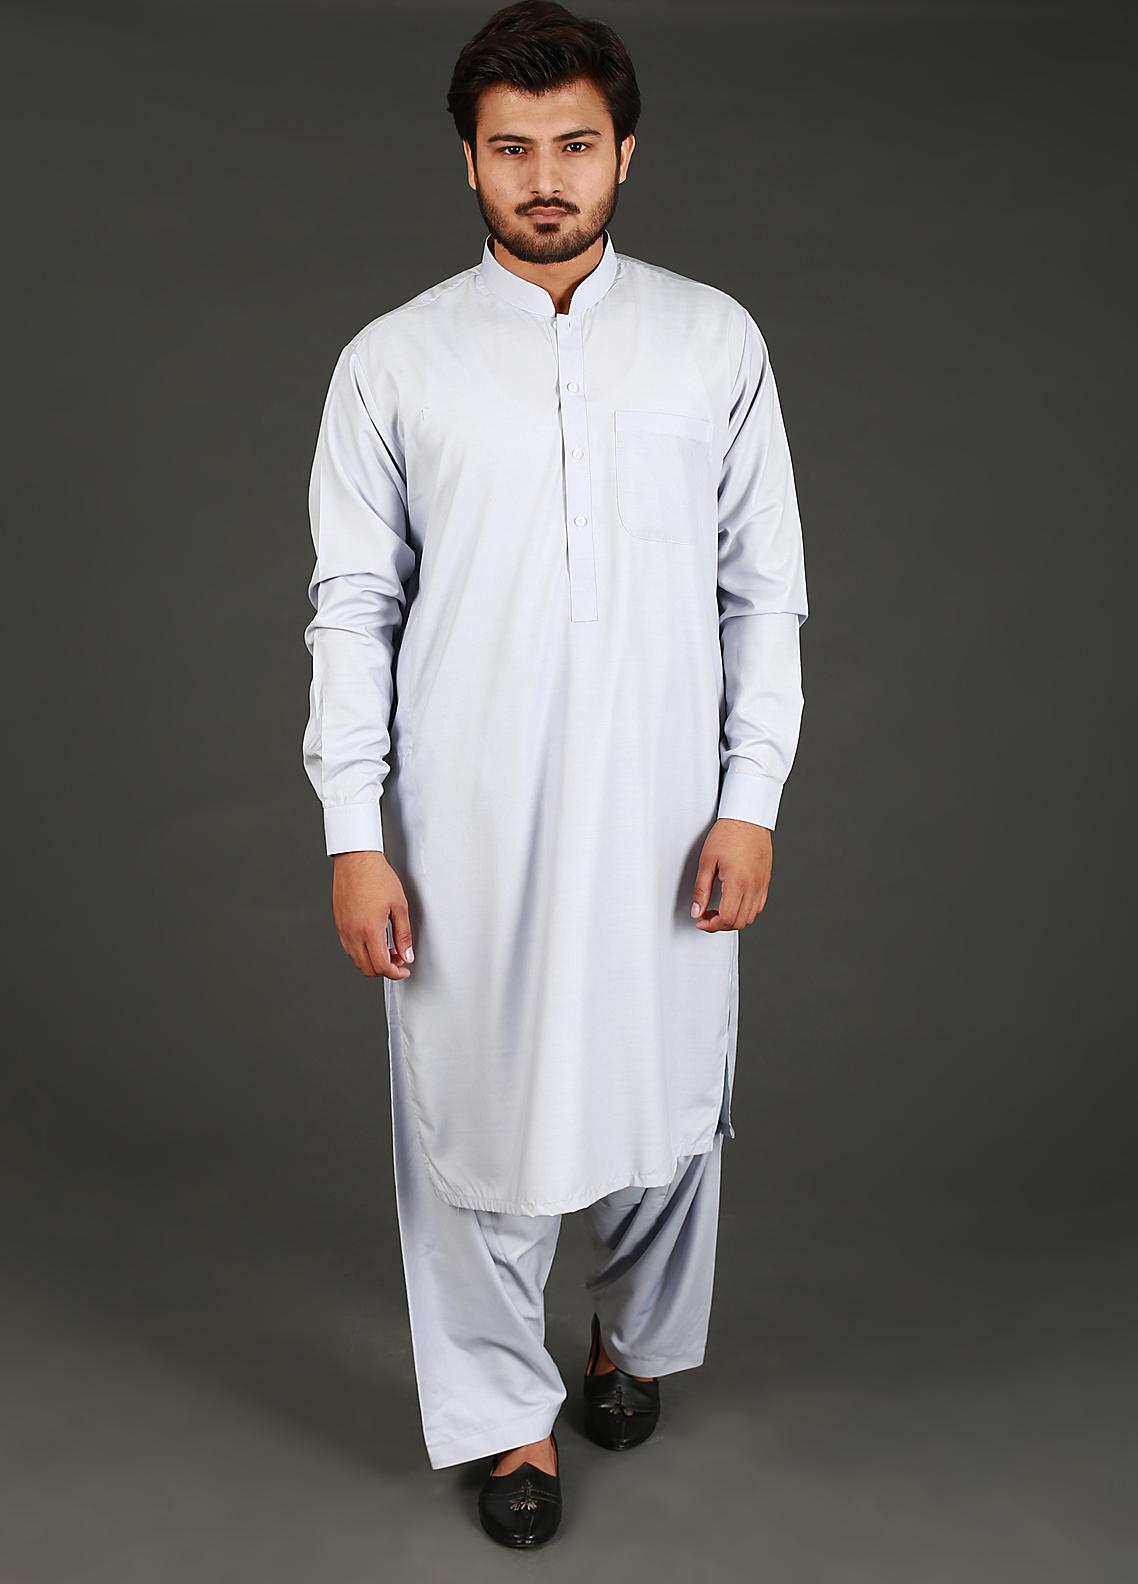 Sanaulla Exclusive Range Cotton Formal Kameez Shalwar for Men -  P-16 Light Blue